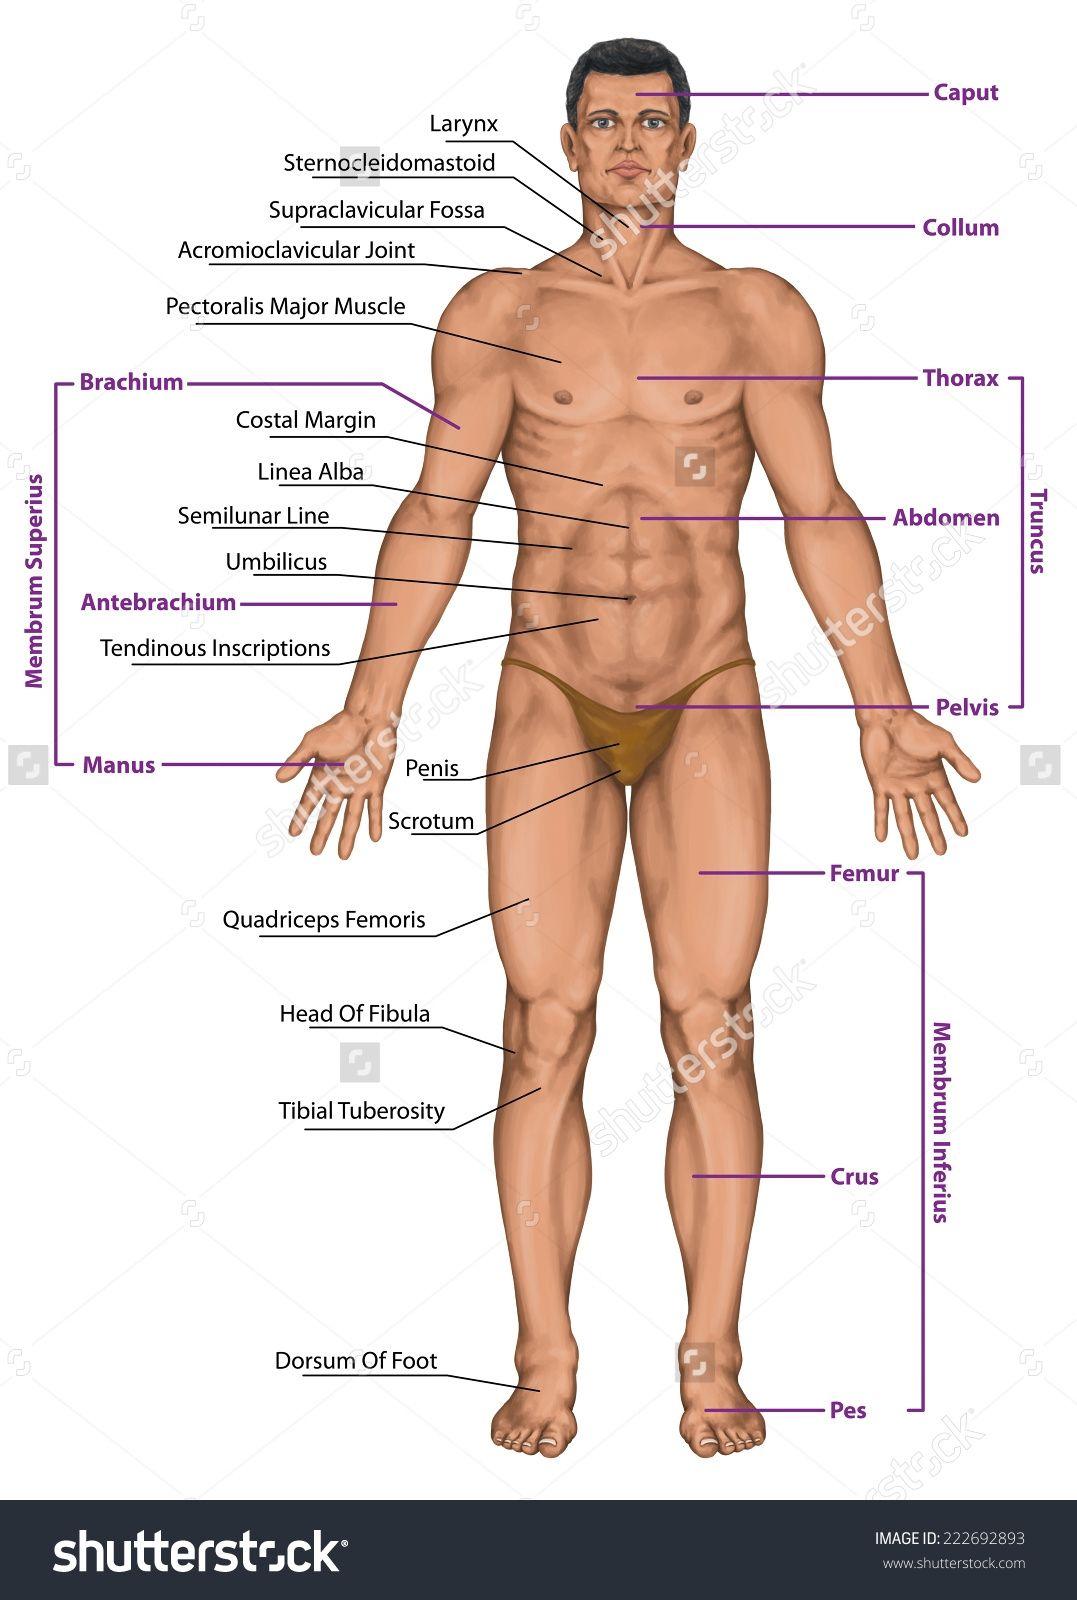 Male Human Anatomy Diagram Human Anatomy Organs Human Body